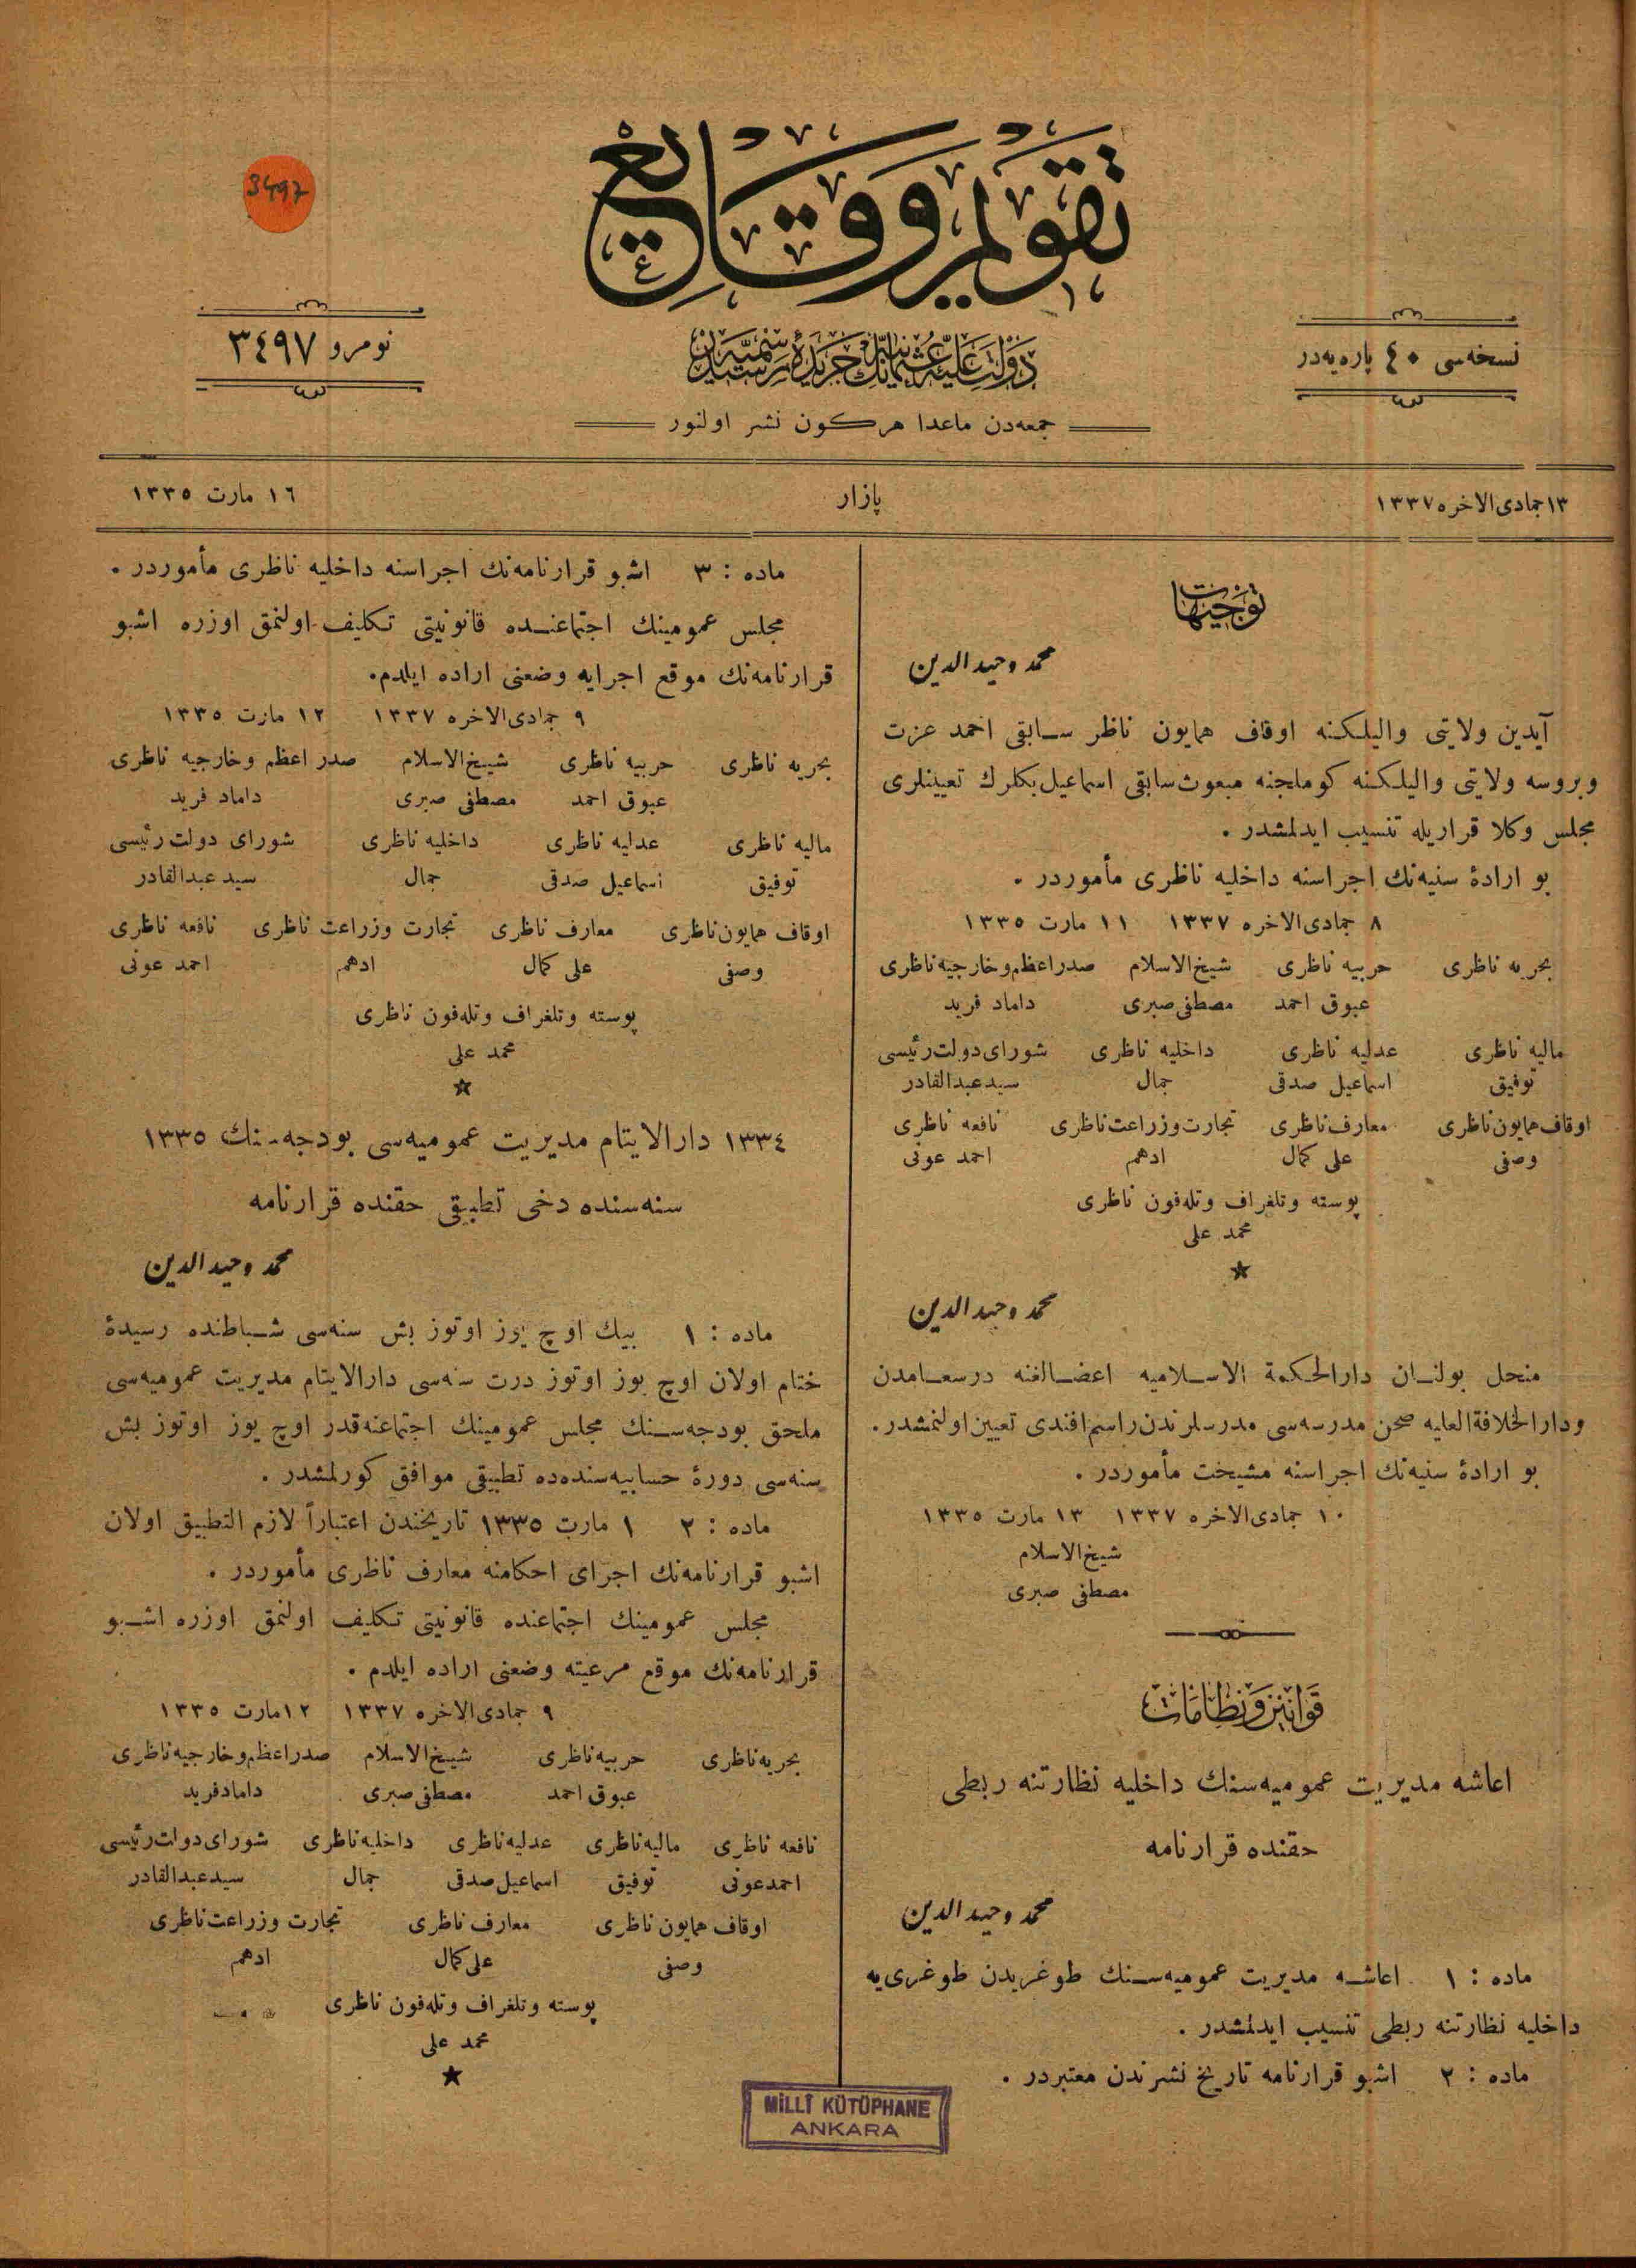 16 Mart 1919 Tarihli Takvim-i Vekayi Gazetesi Sayfa 1